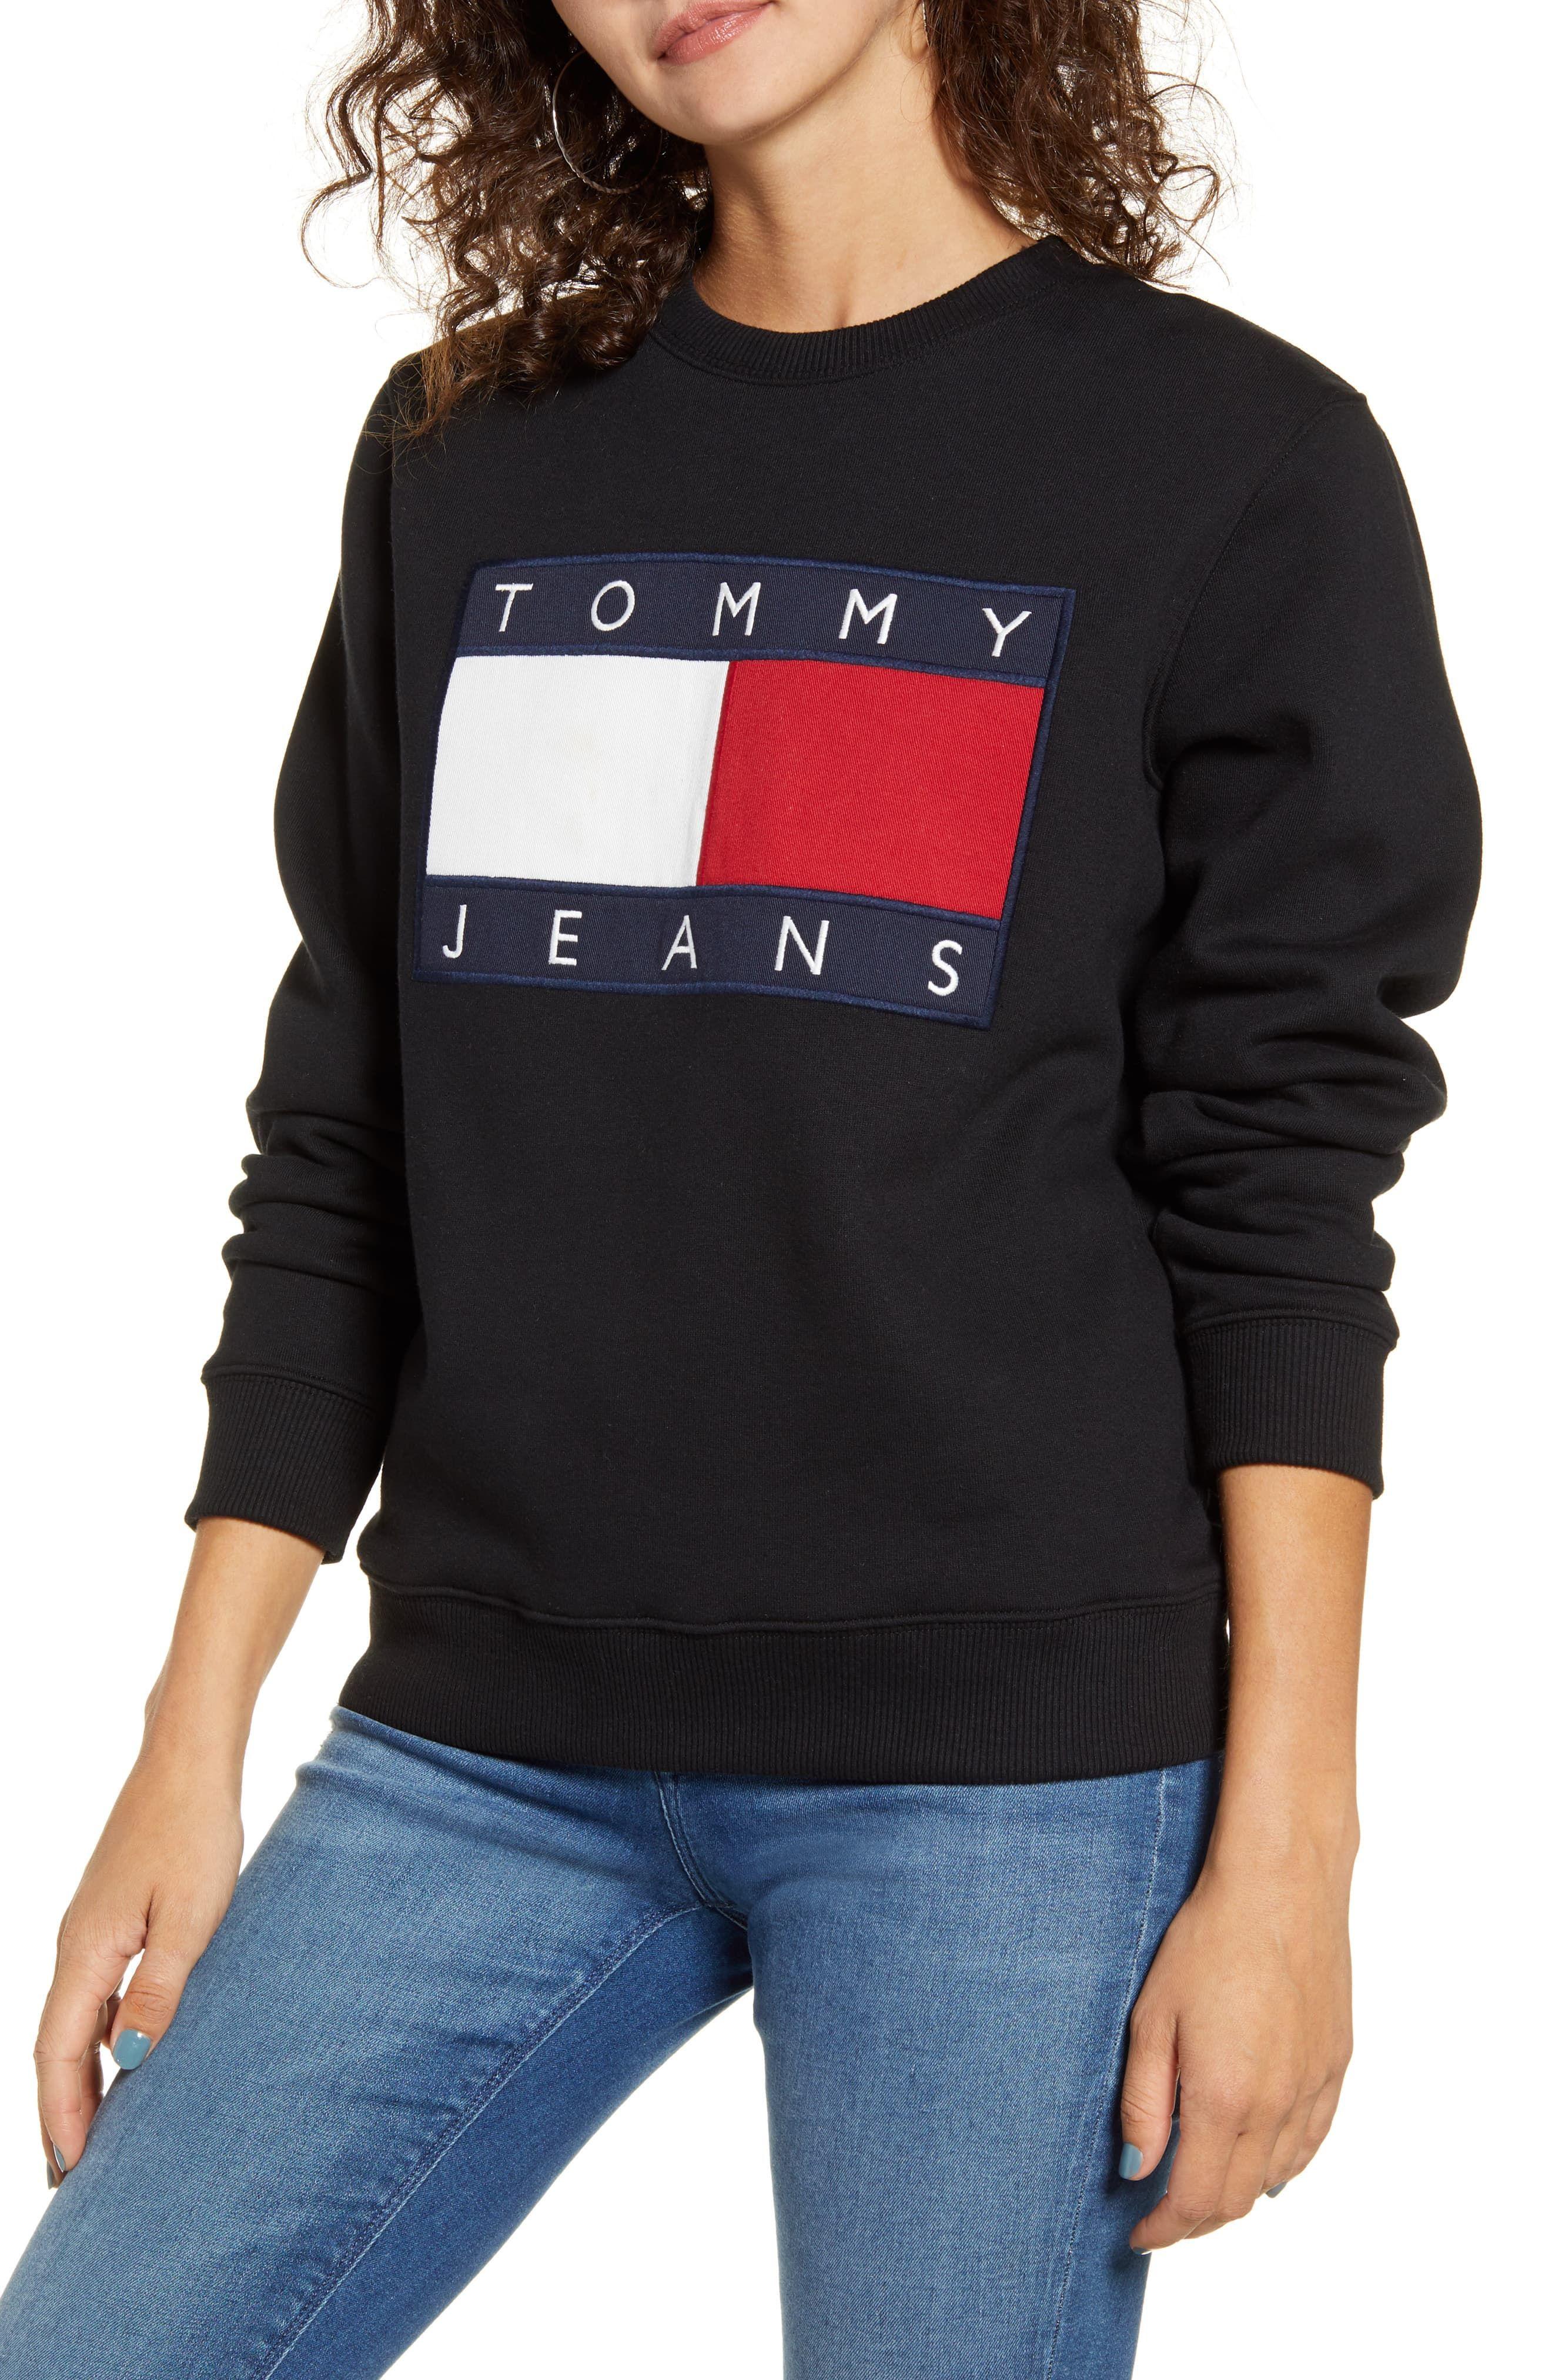 TOMMY JEANS Flag Sweatshirt | Sweatshirts, Crew neck